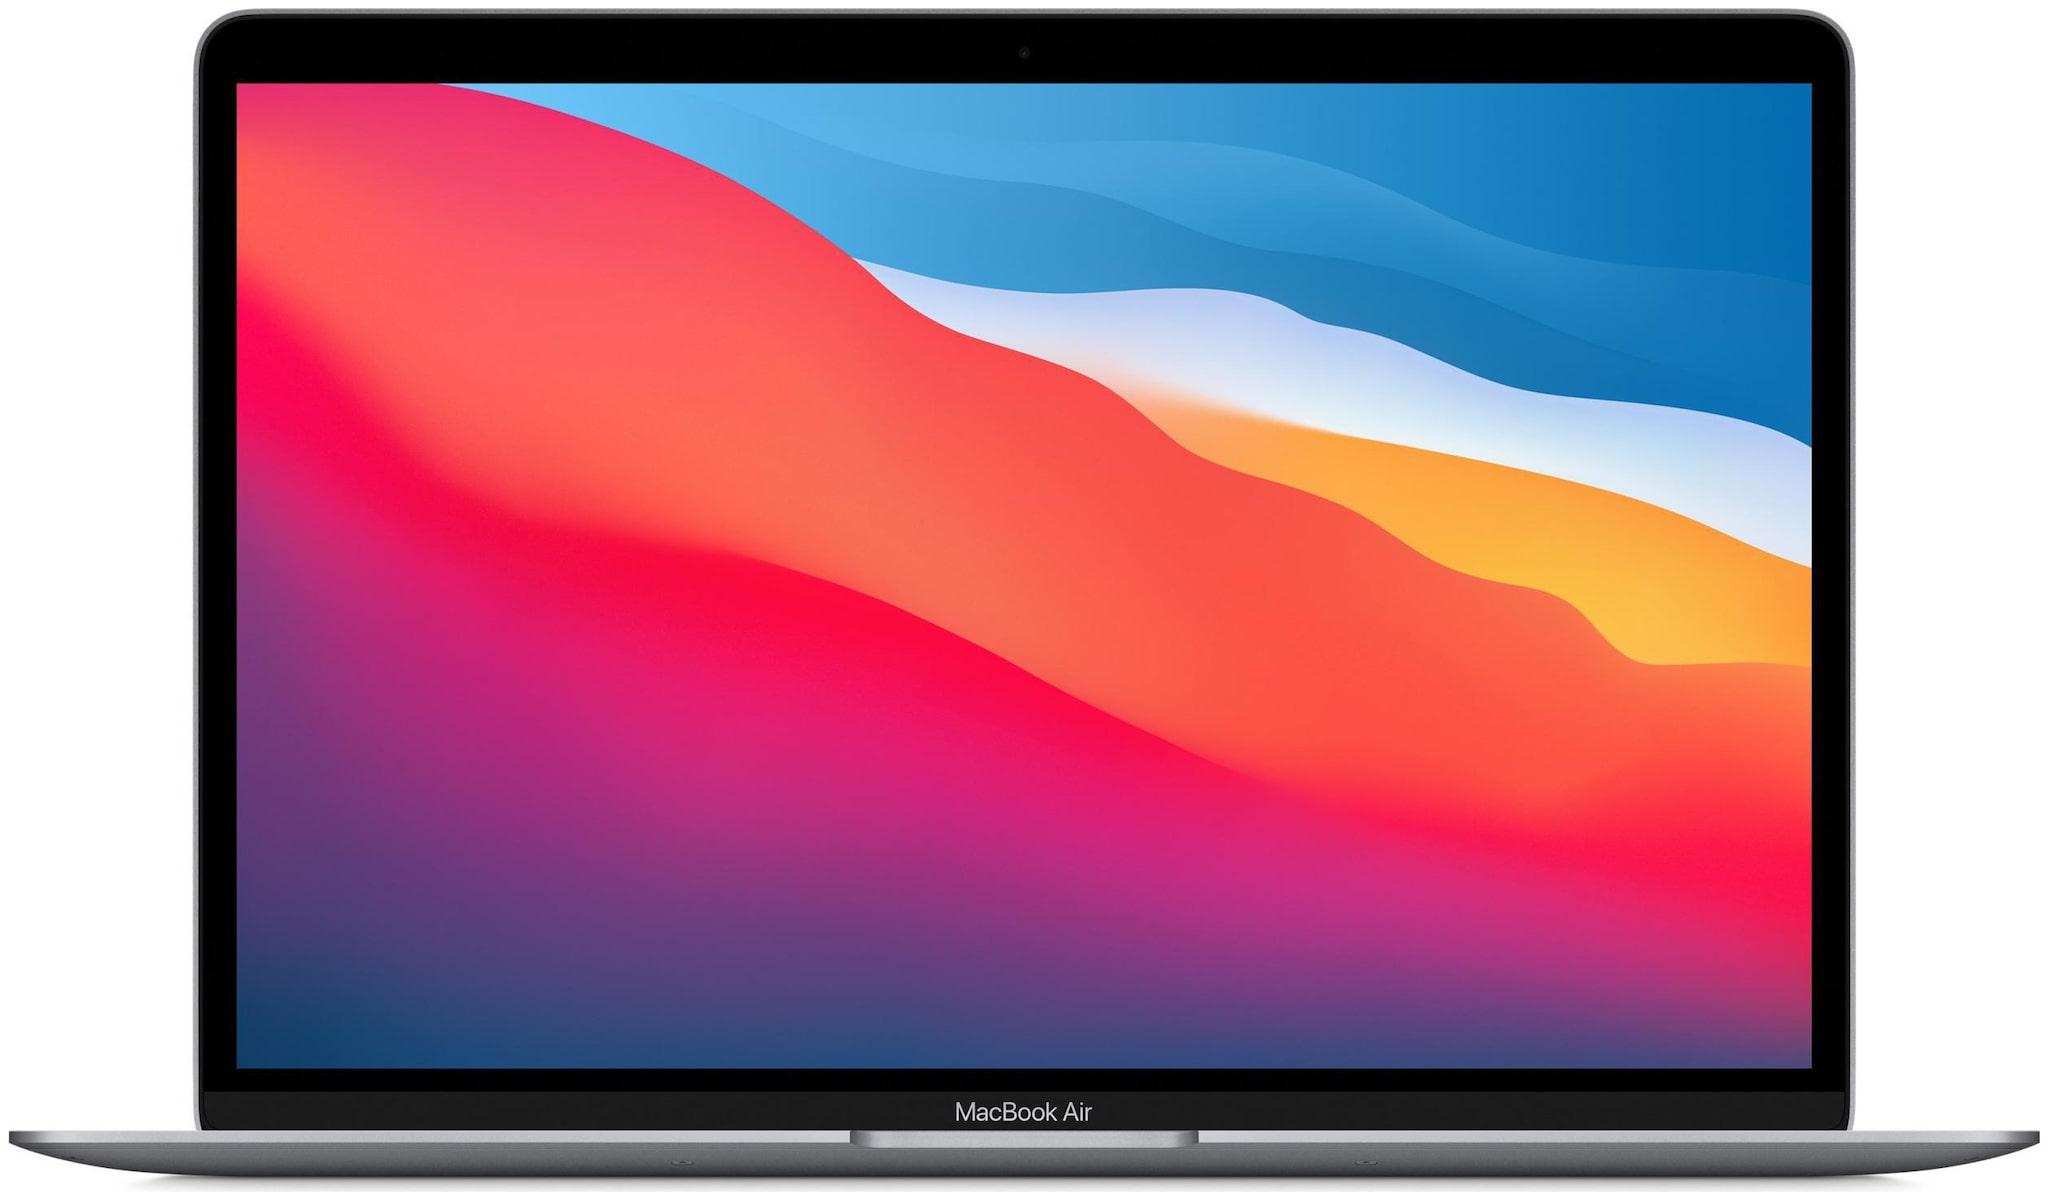 Apple MacBook Air M1    8  GB/512  GB SSD/Mac OS Big Sur  MGN73HN/A  13.3 inch, Space Grey, 1.29 kg  by Kida Retail